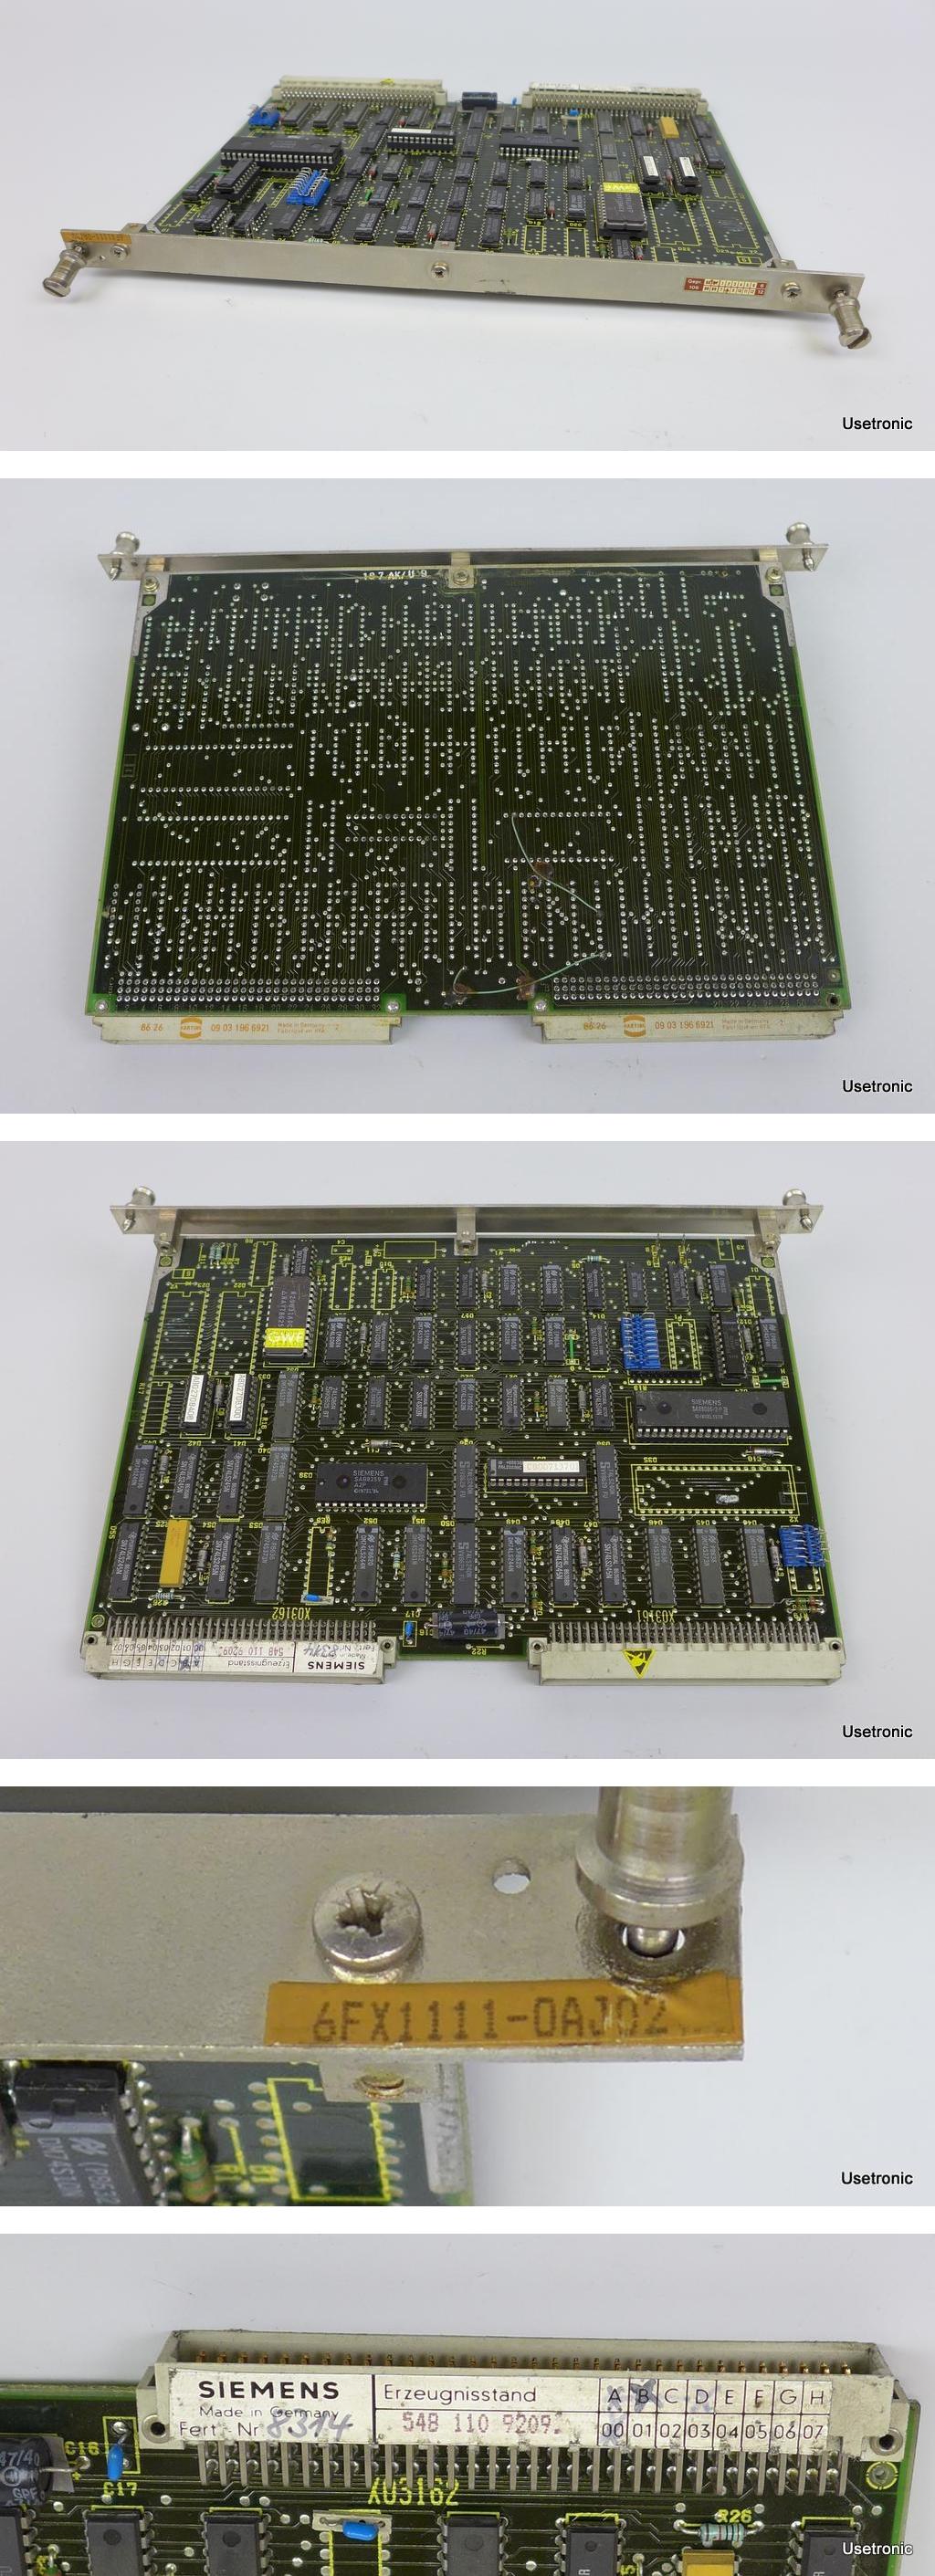 Siemens 6FX1111-0AJ02